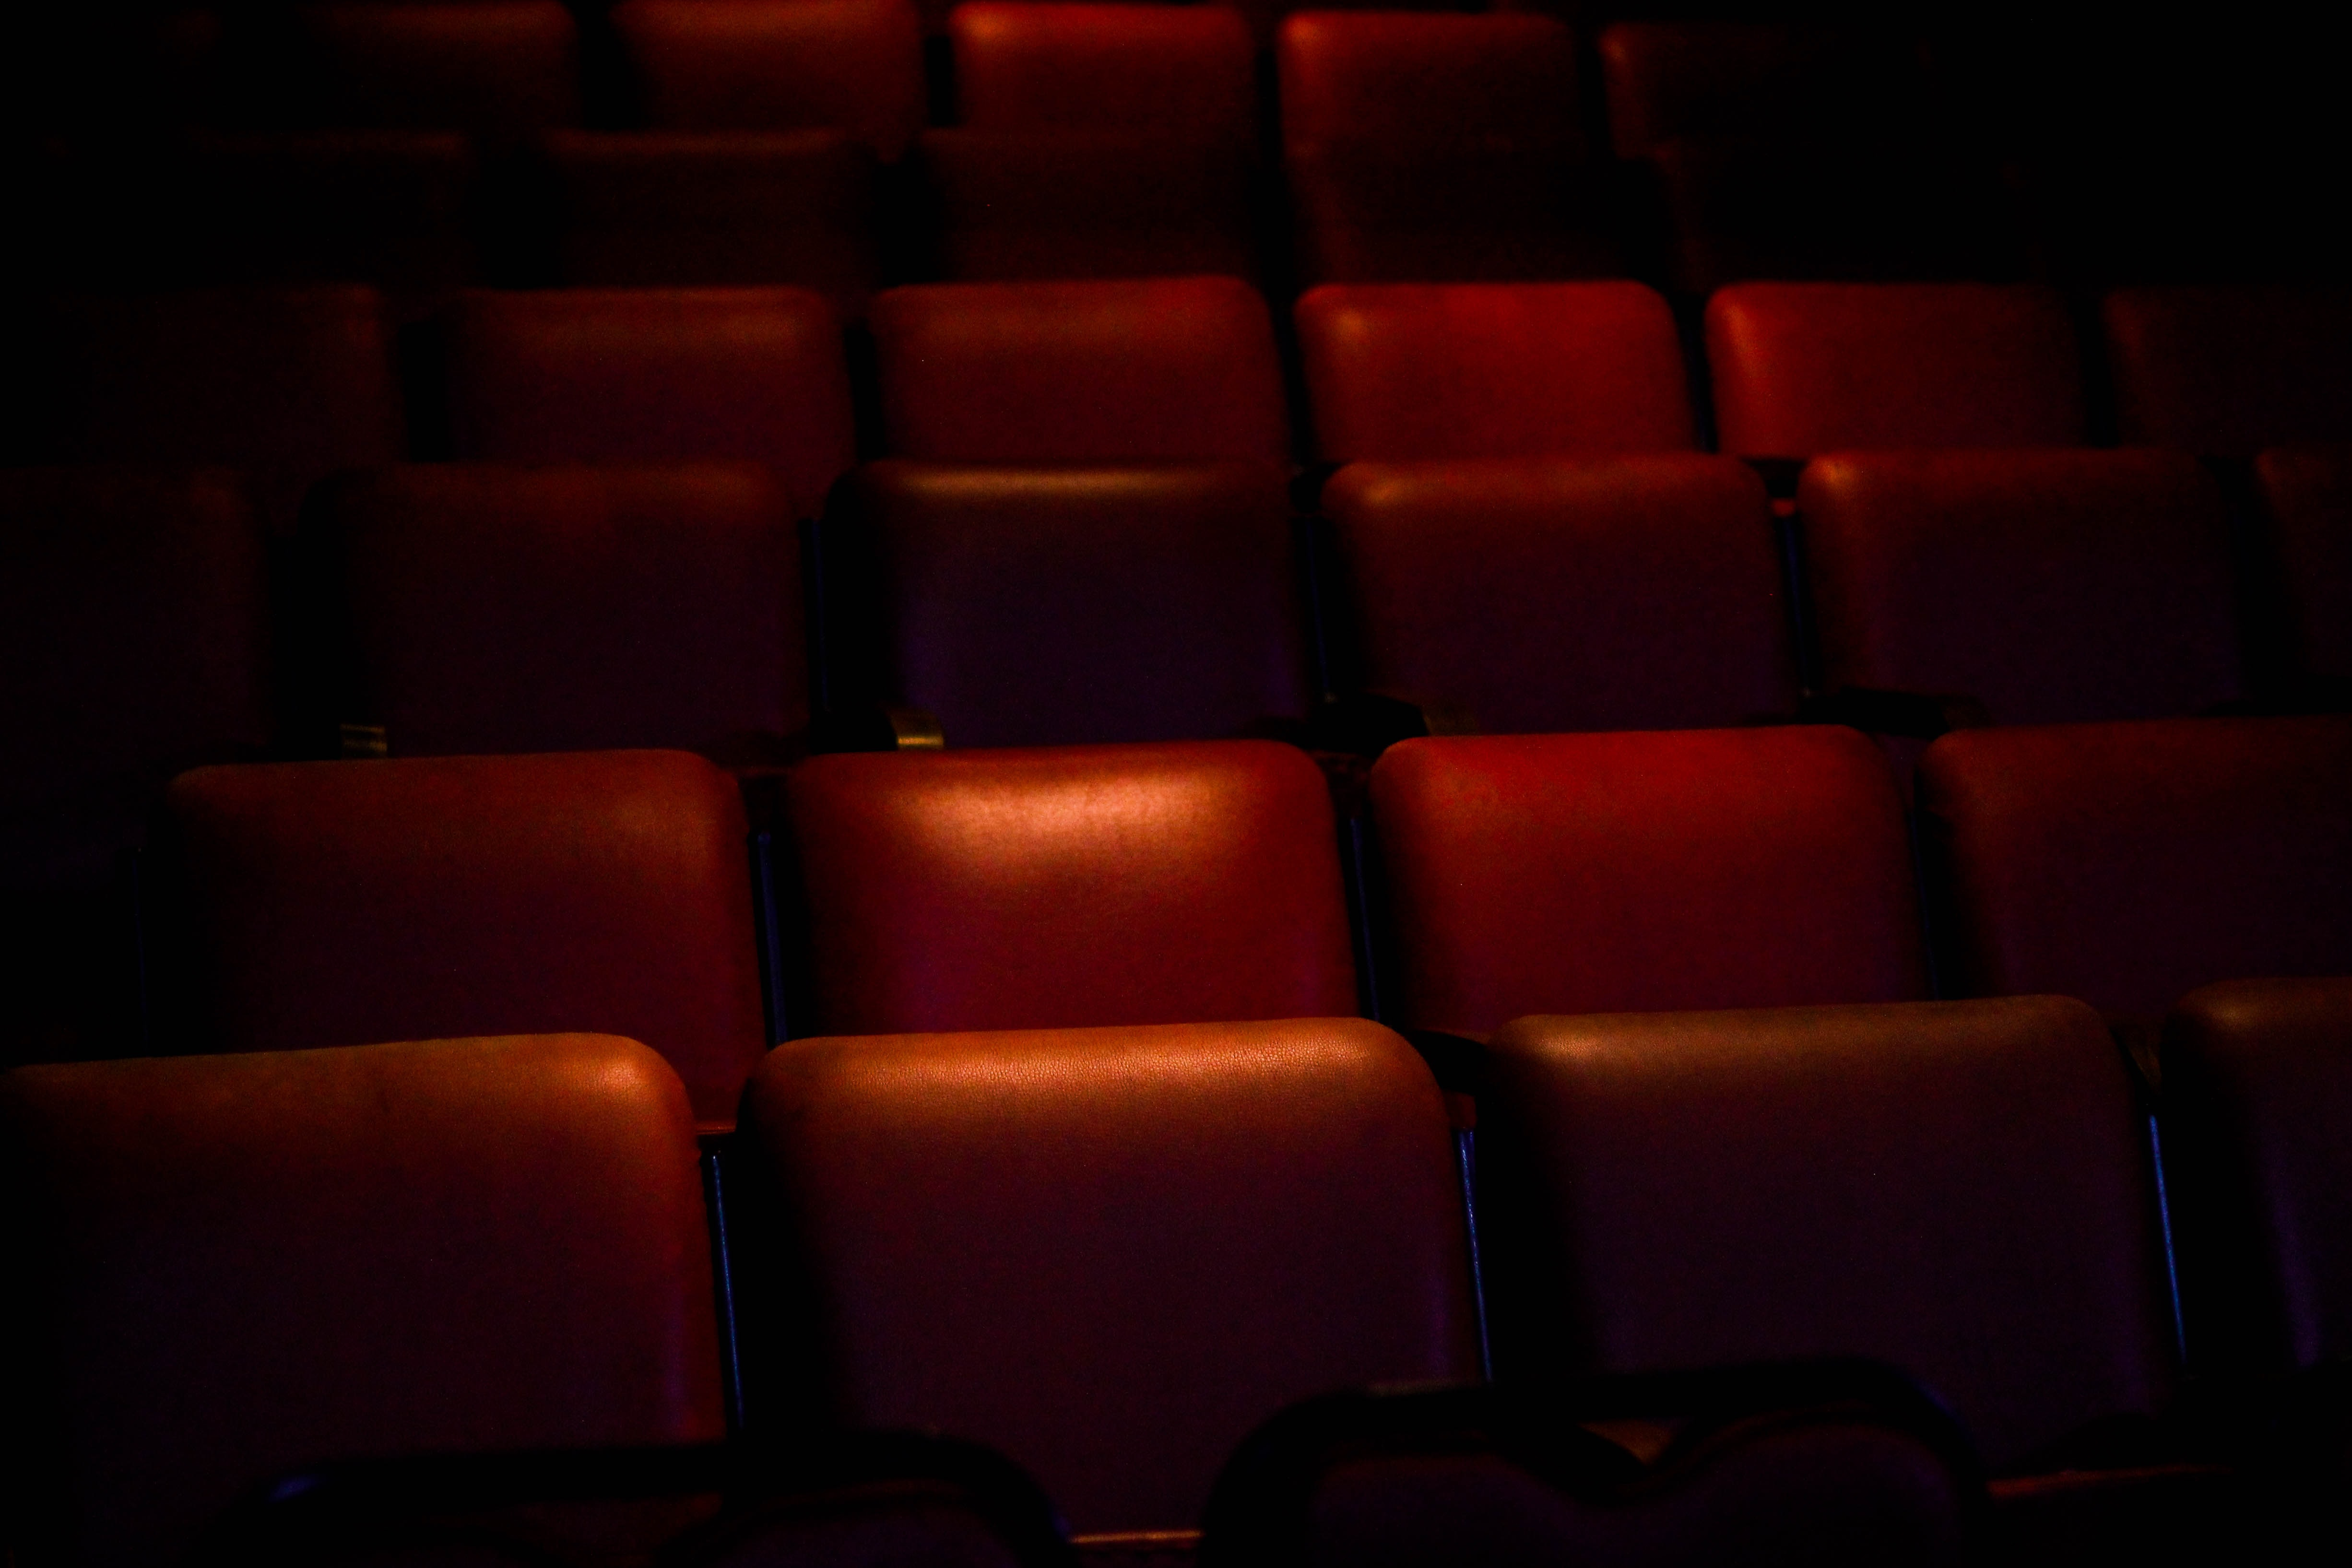 red empty cinema chairs & Movies | 36 best free movie cinema light and film photos on Unsplash